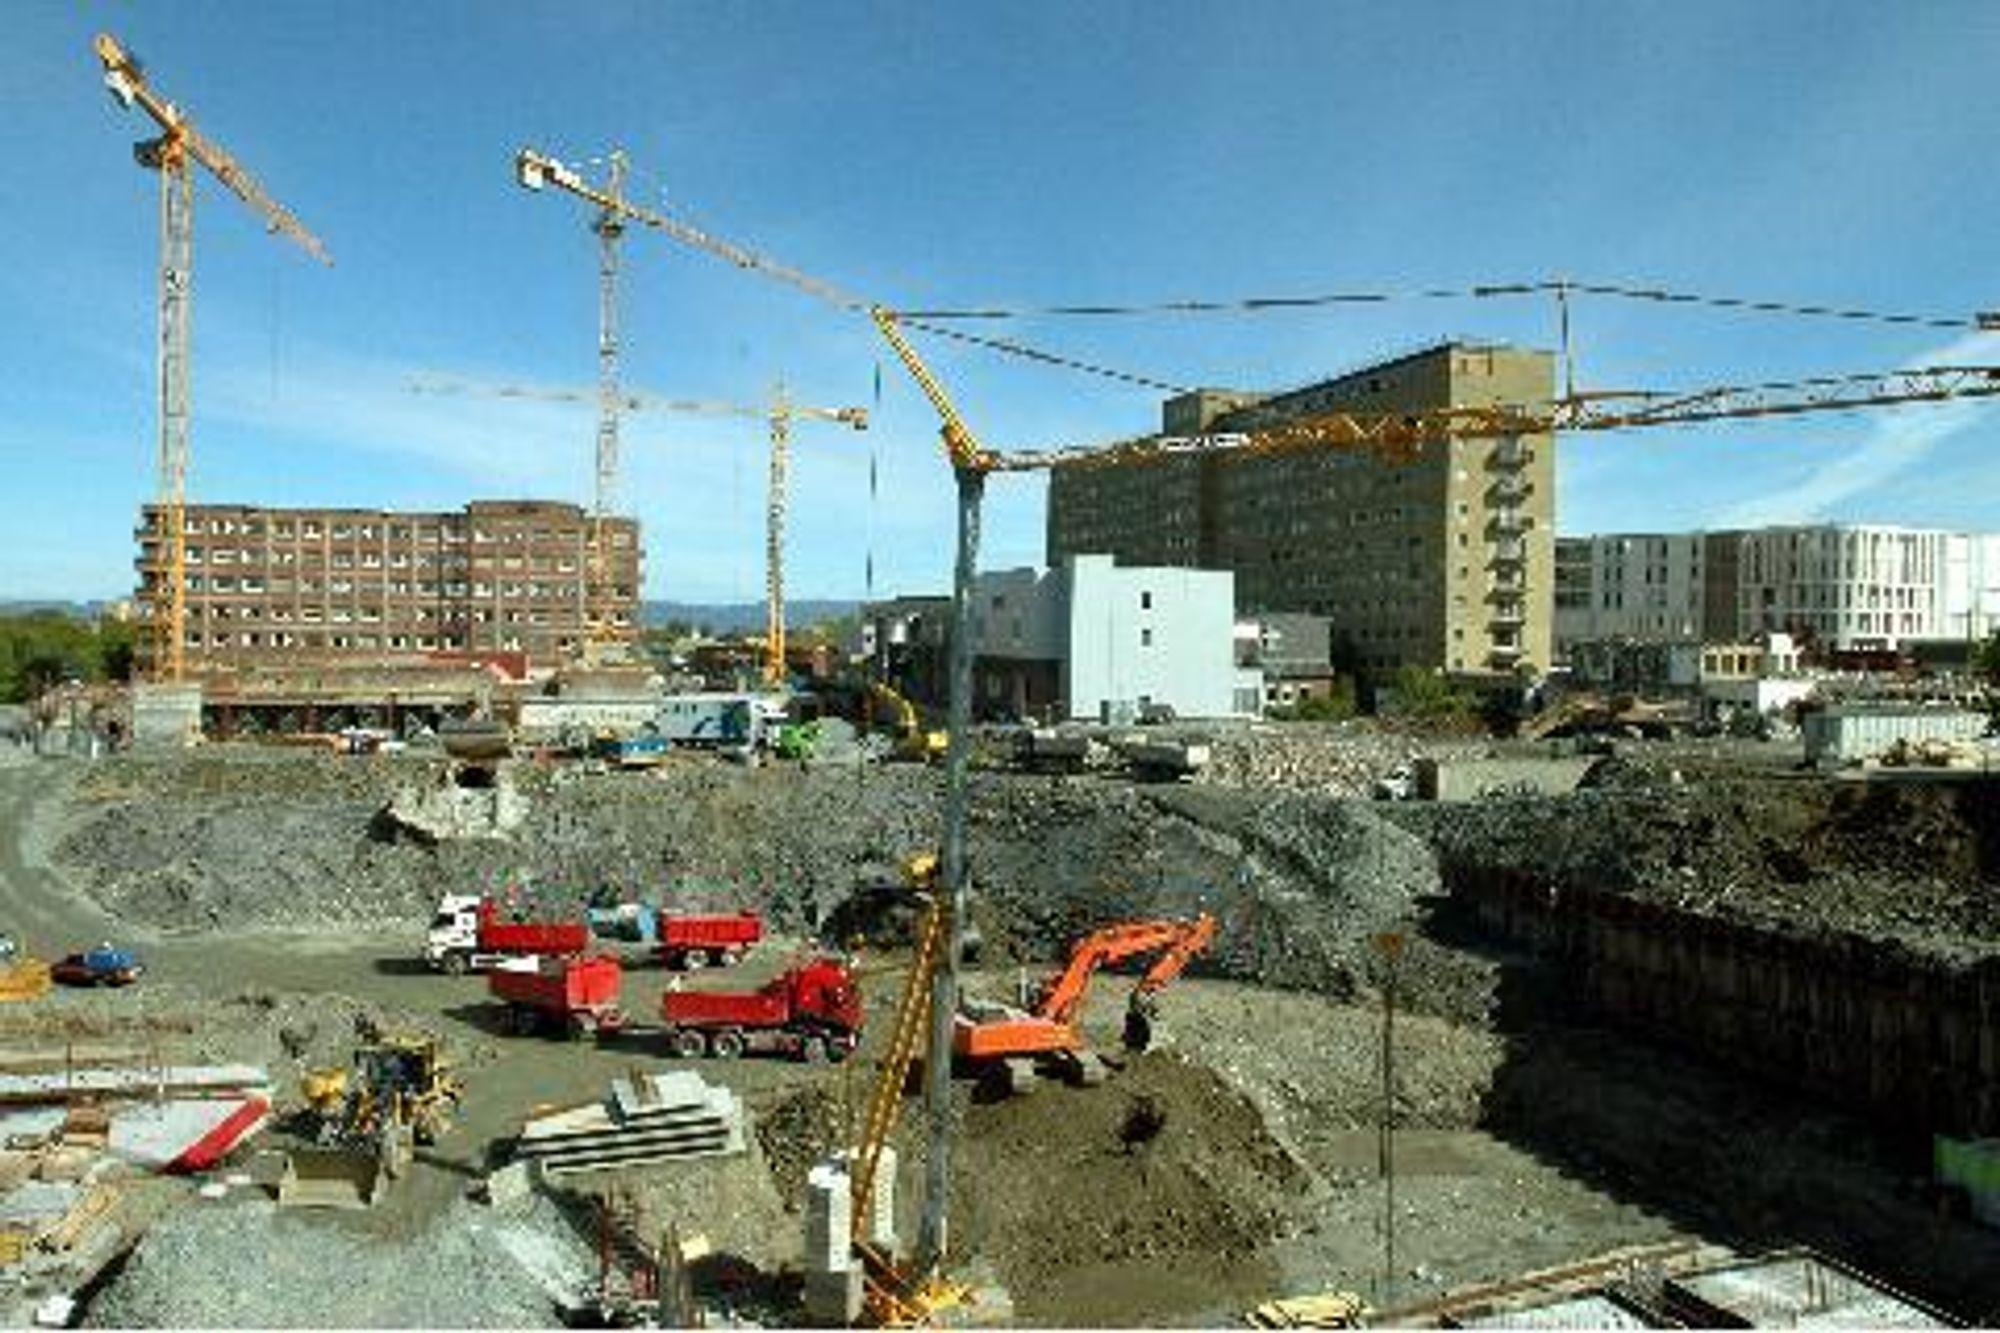 Ny datasvikt ved St. Olavs hospital